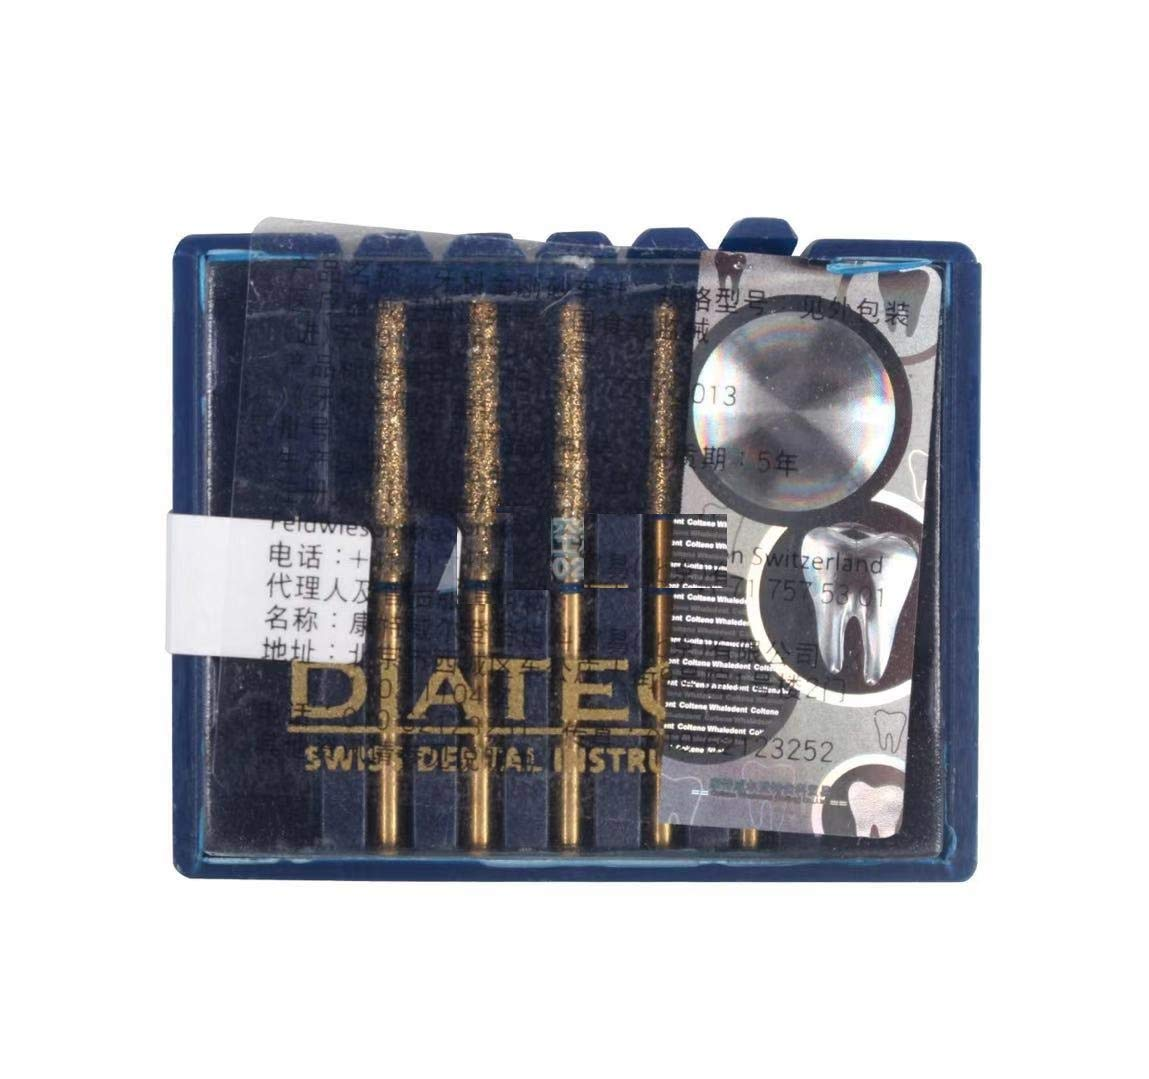 Dental COLTENE Diatech carborundum needle kit 856XL-018-12ML